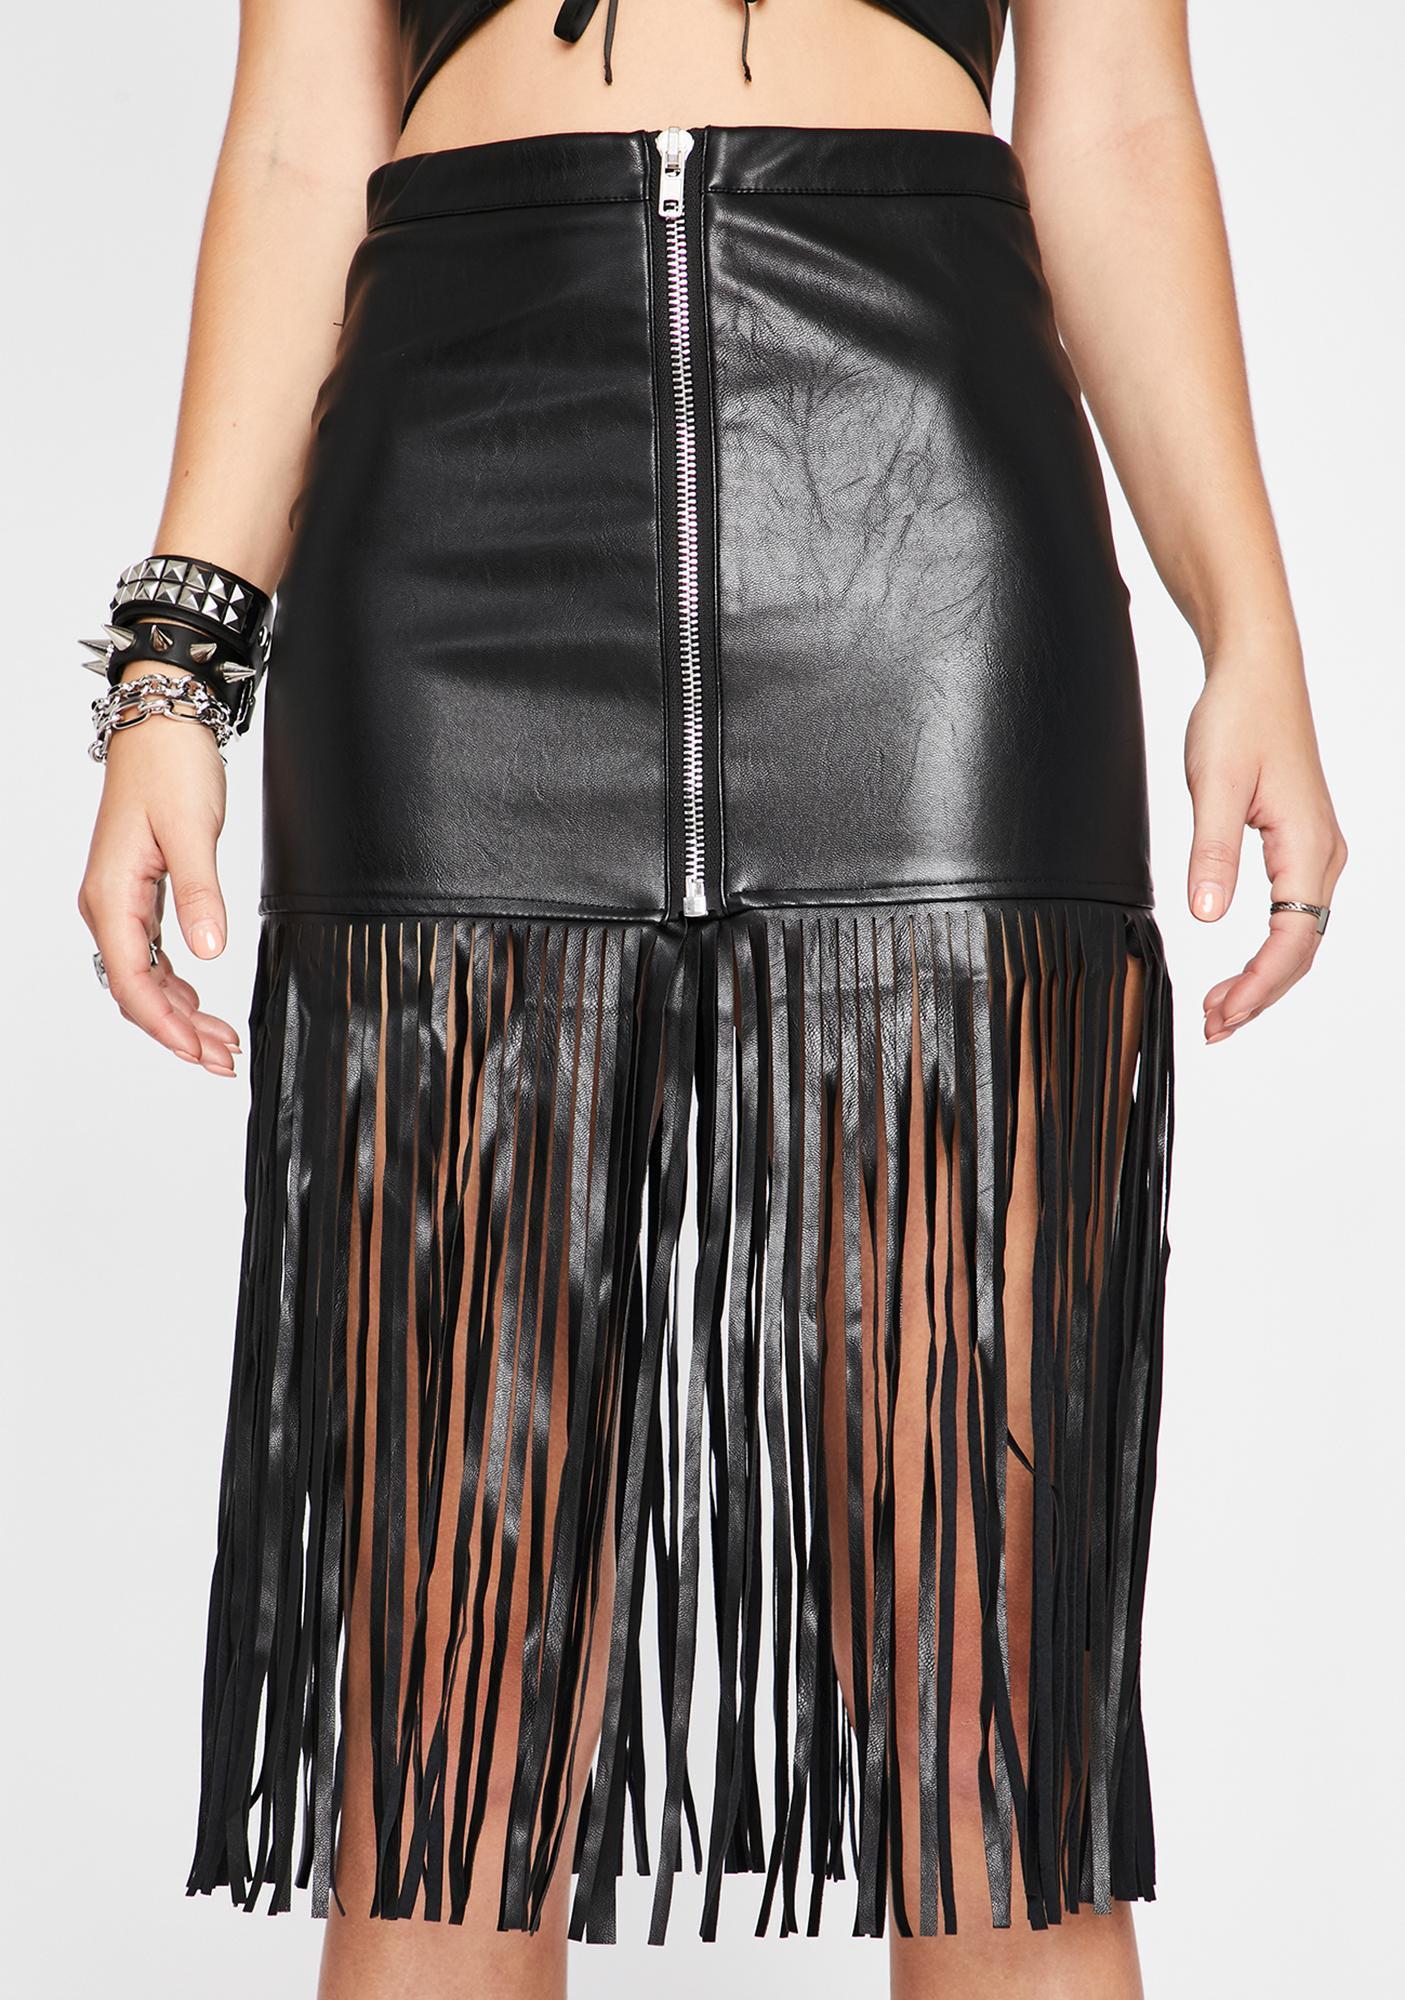 My Kinda Crazy Fringe Skirt